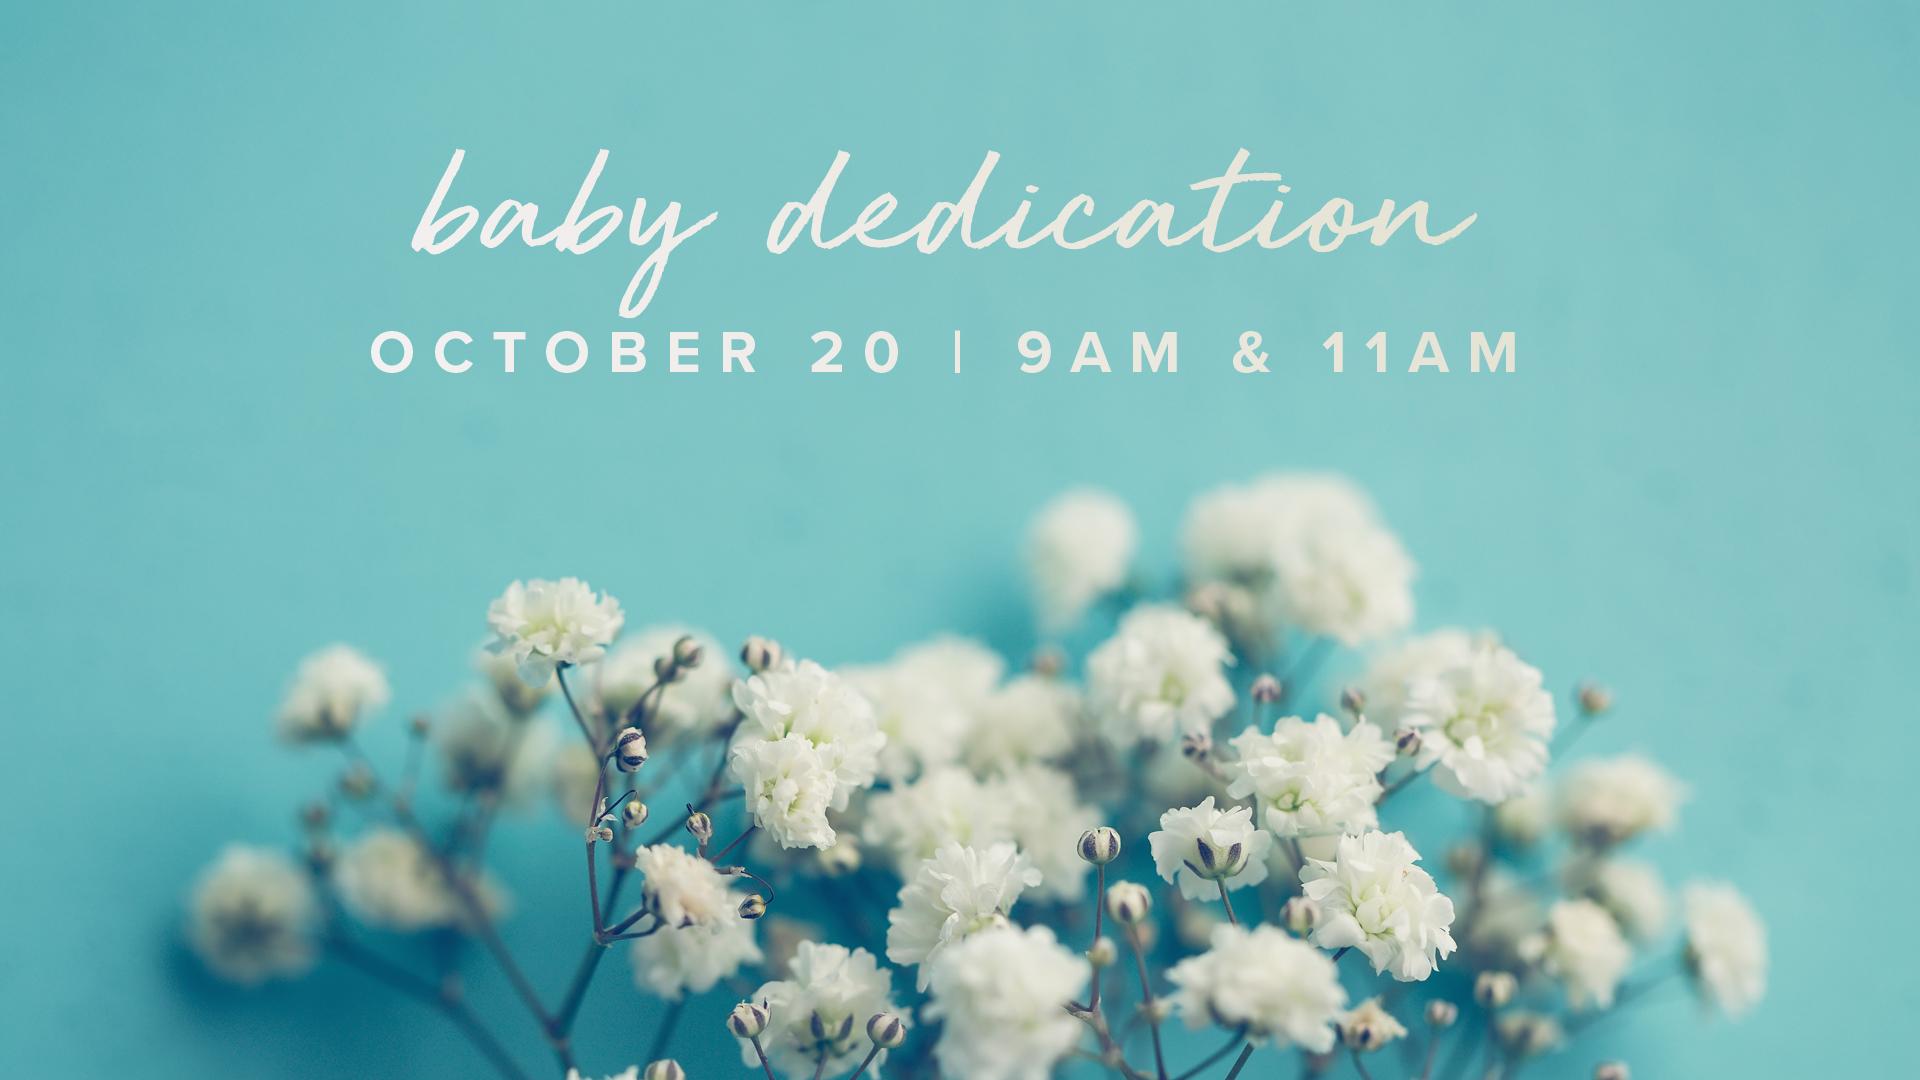 Baby Dedications at the Buford campus